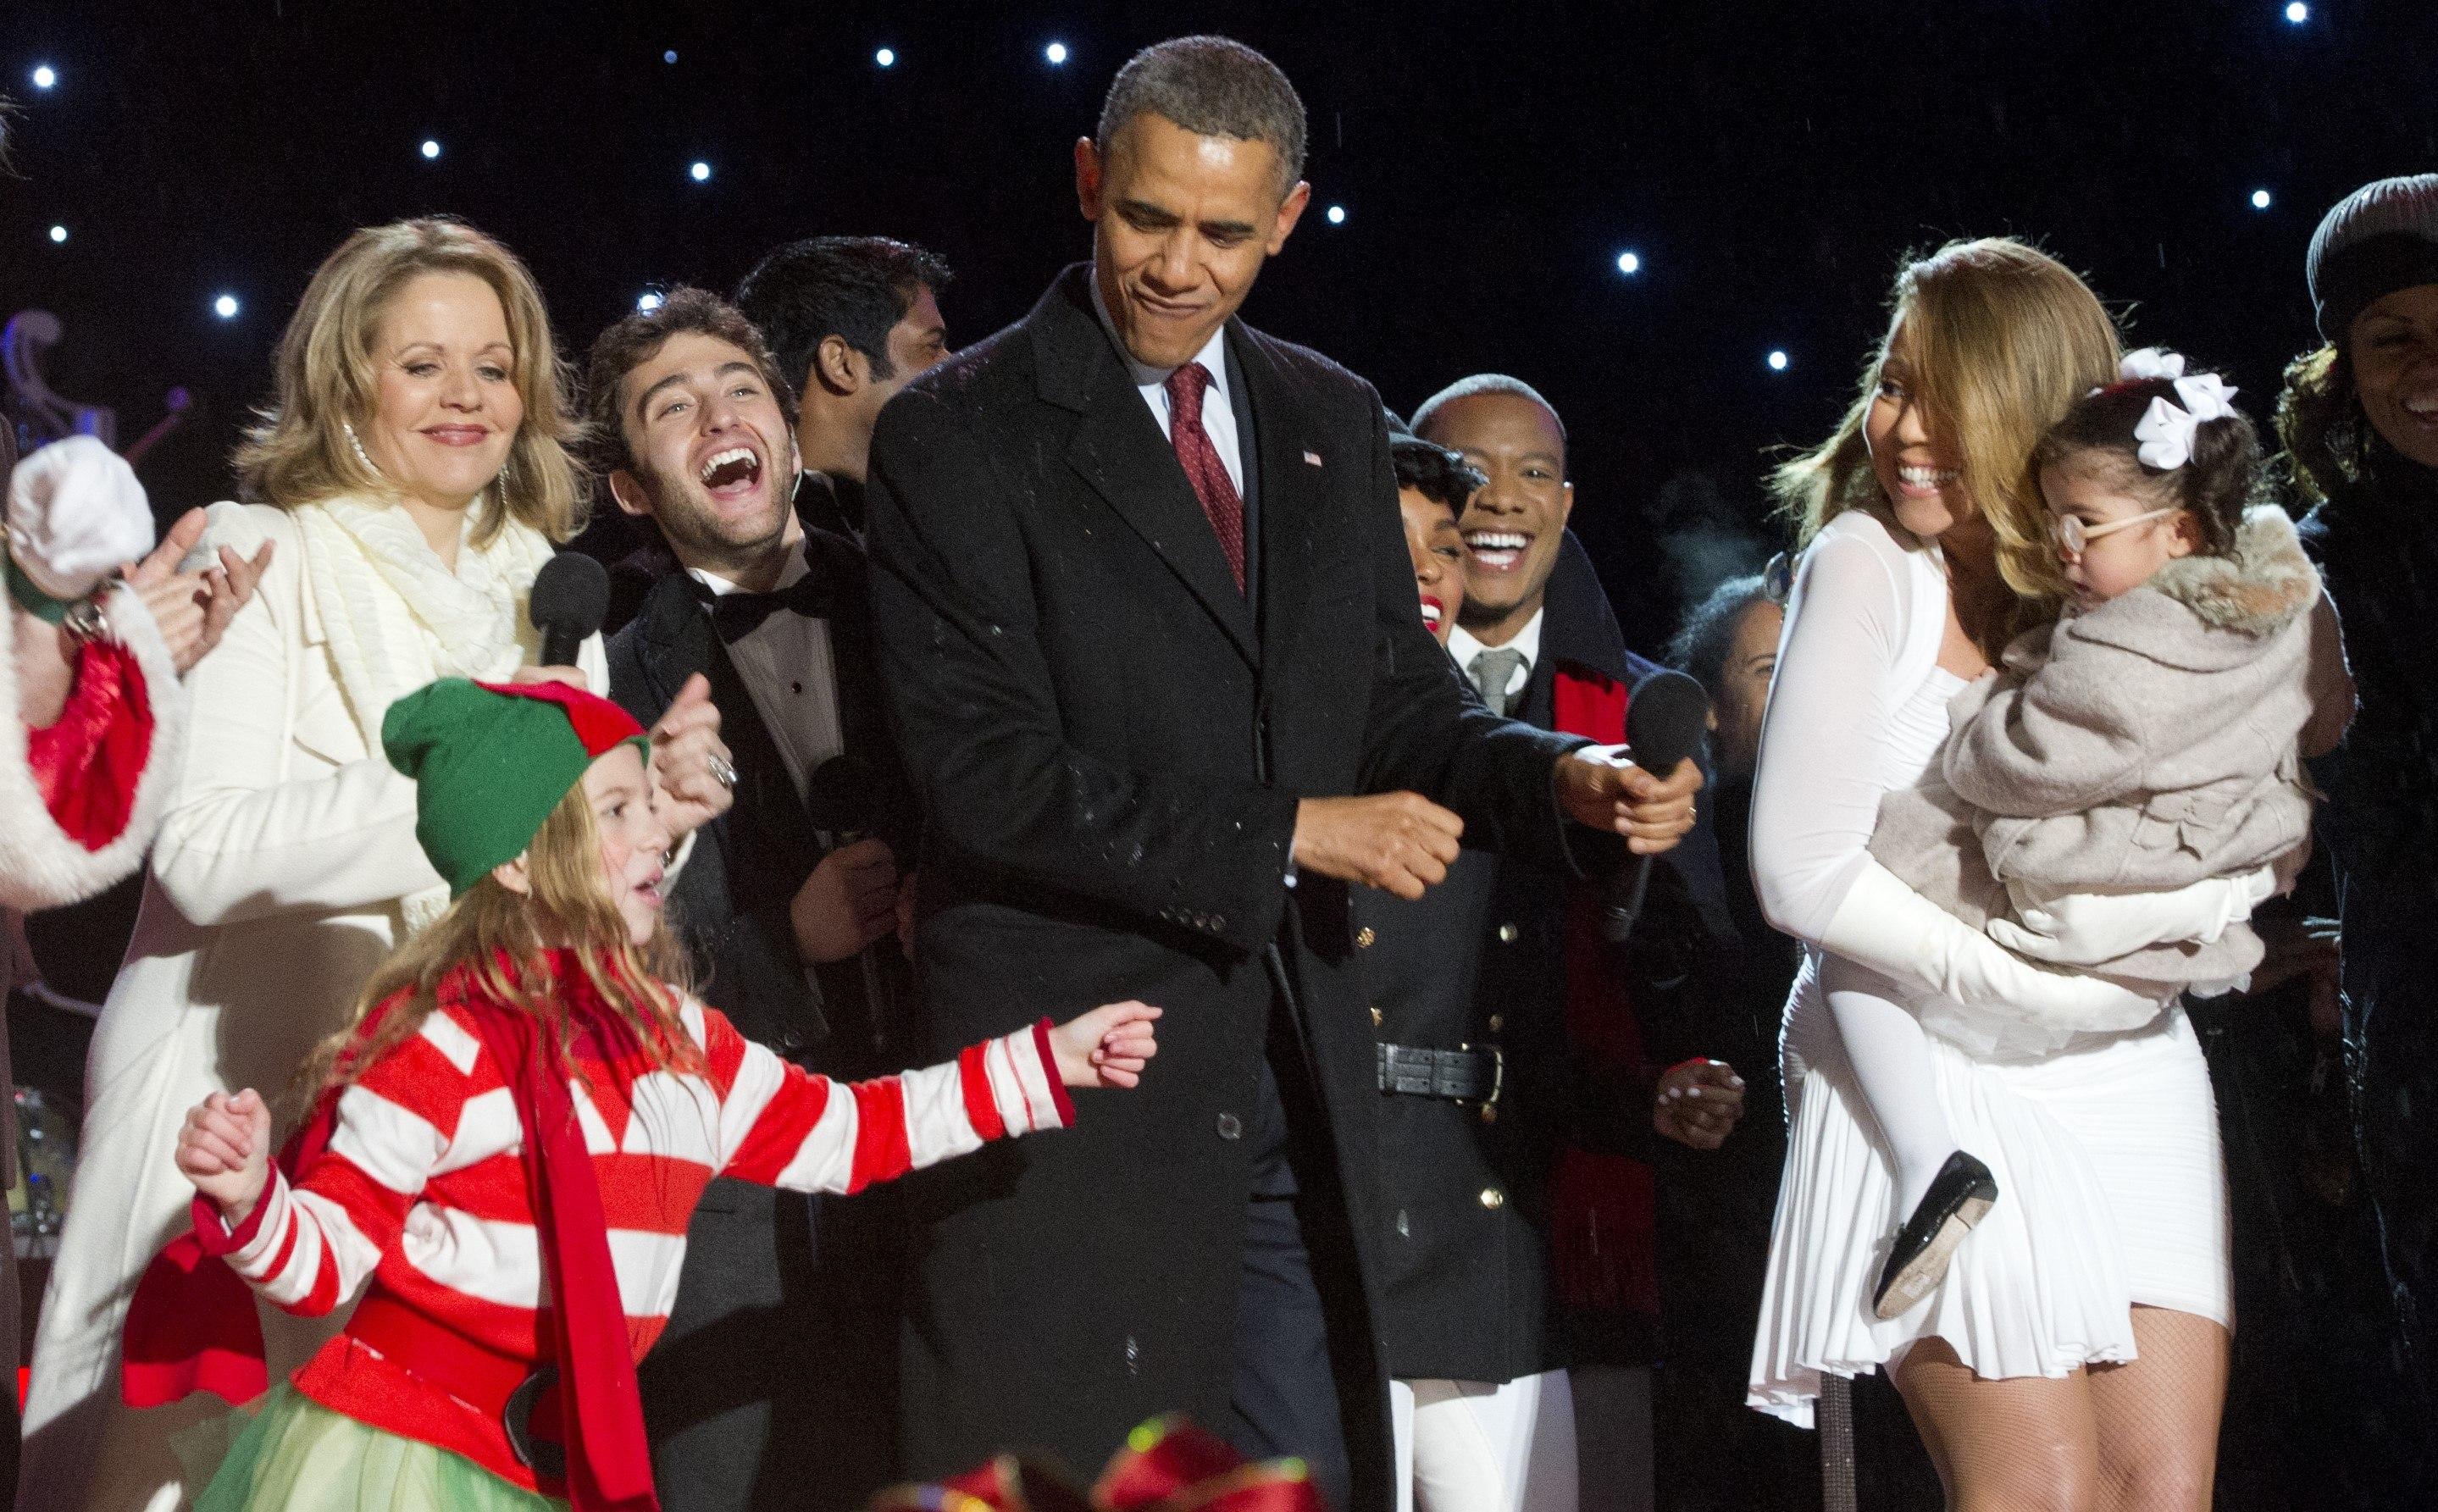 Barack Obama and Mariah Carrey Christmas performance